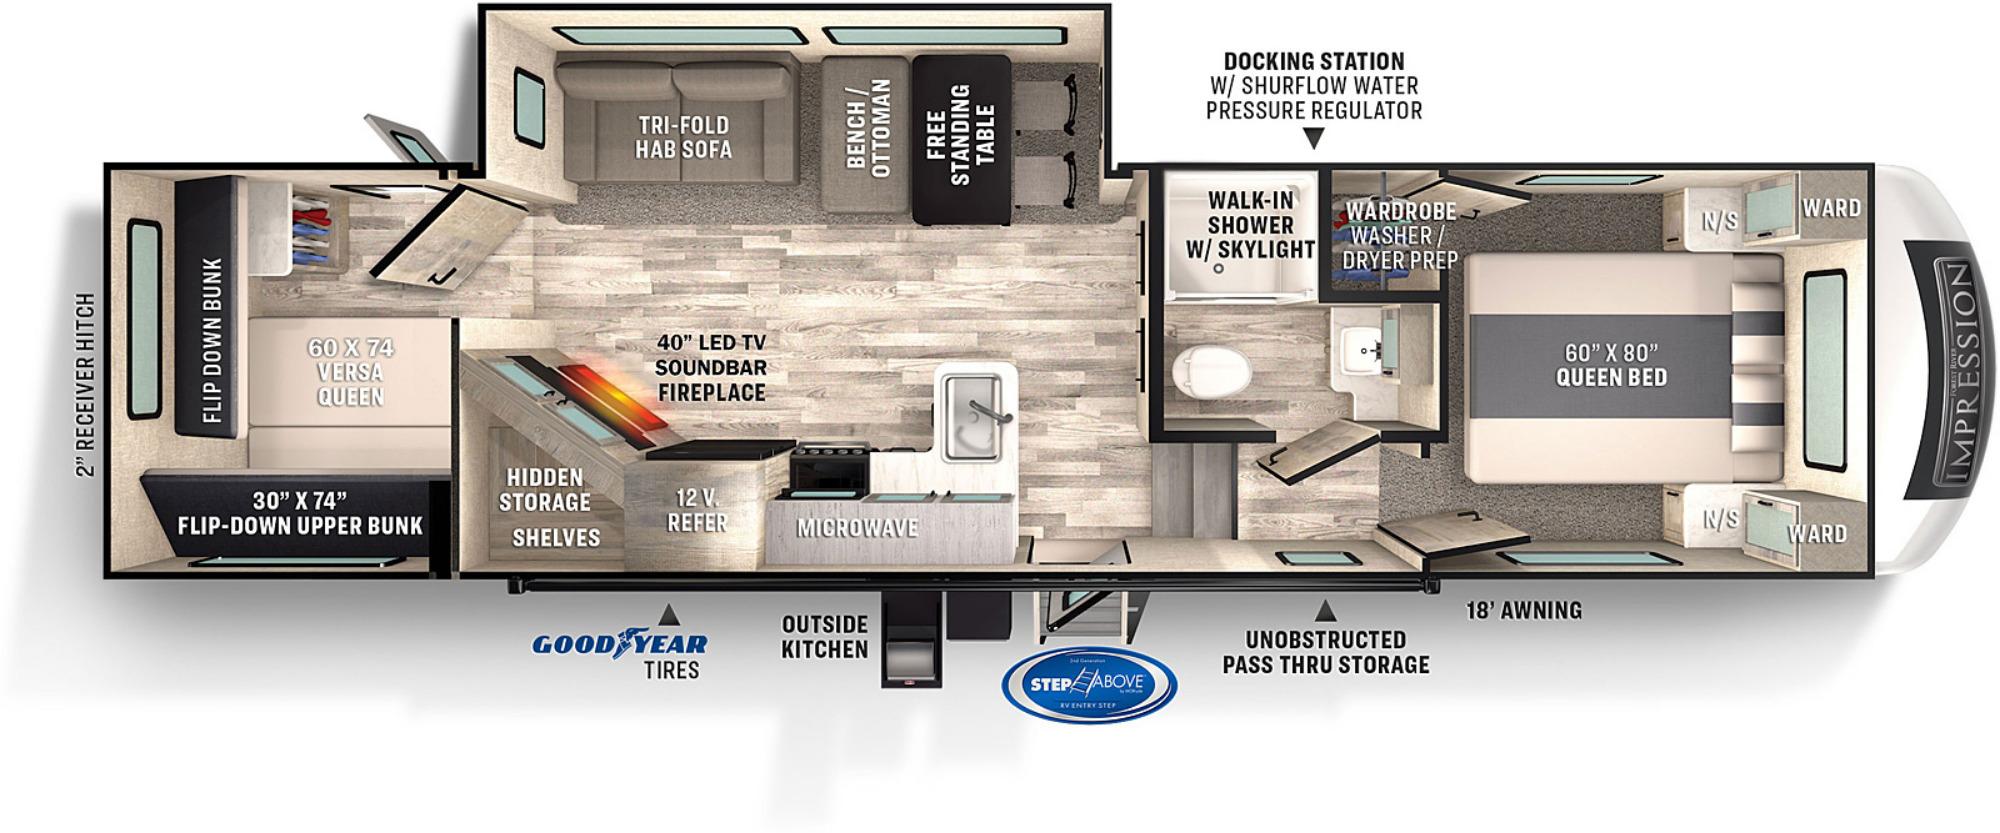 View Floor Plan for 2022 FOREST RIVER IMPRESSION 290VB